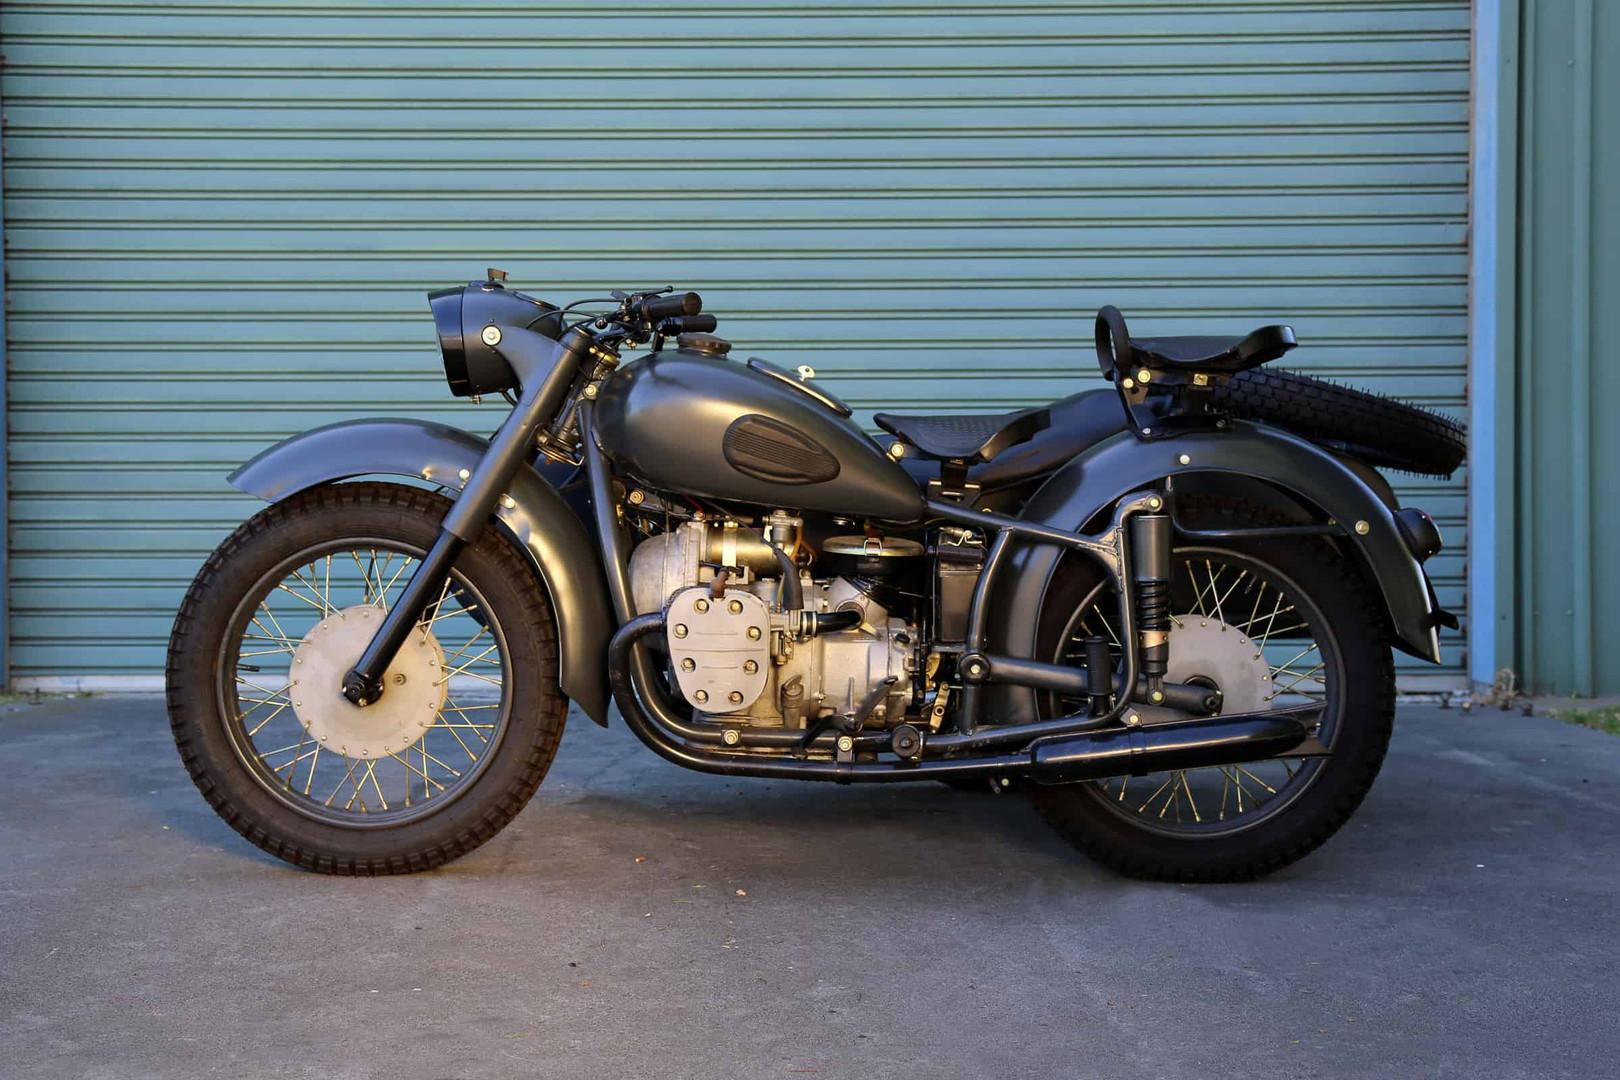 1959-KMZK750-cls.jpg